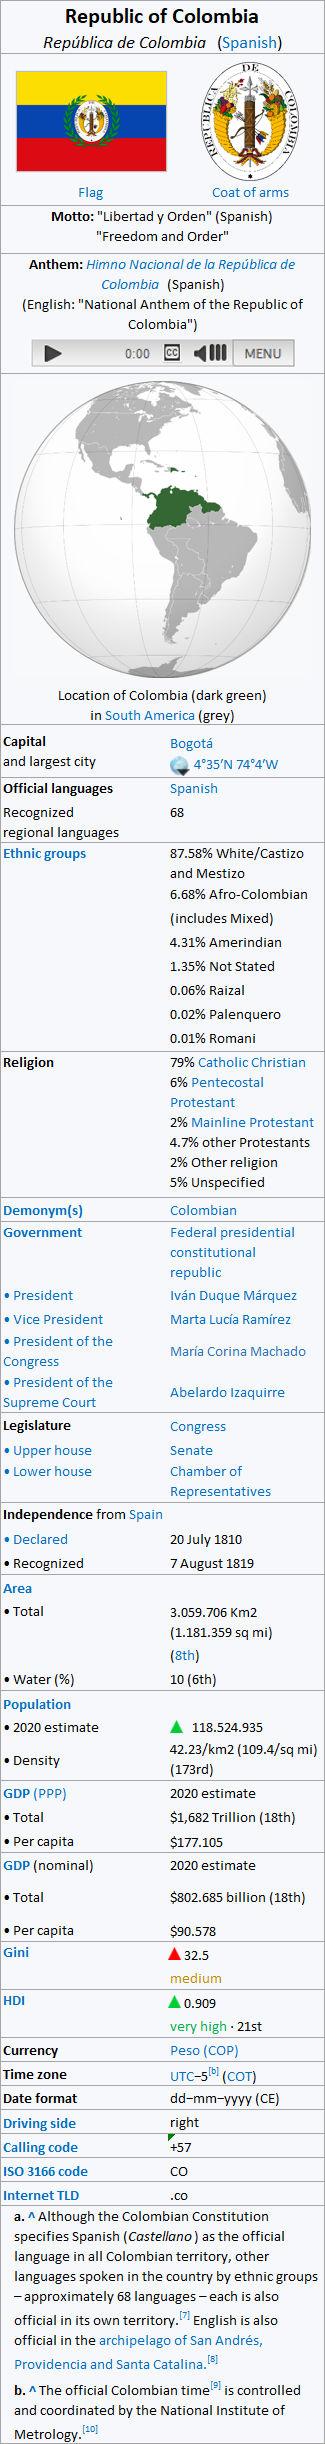 Gran Colombia - Infobox